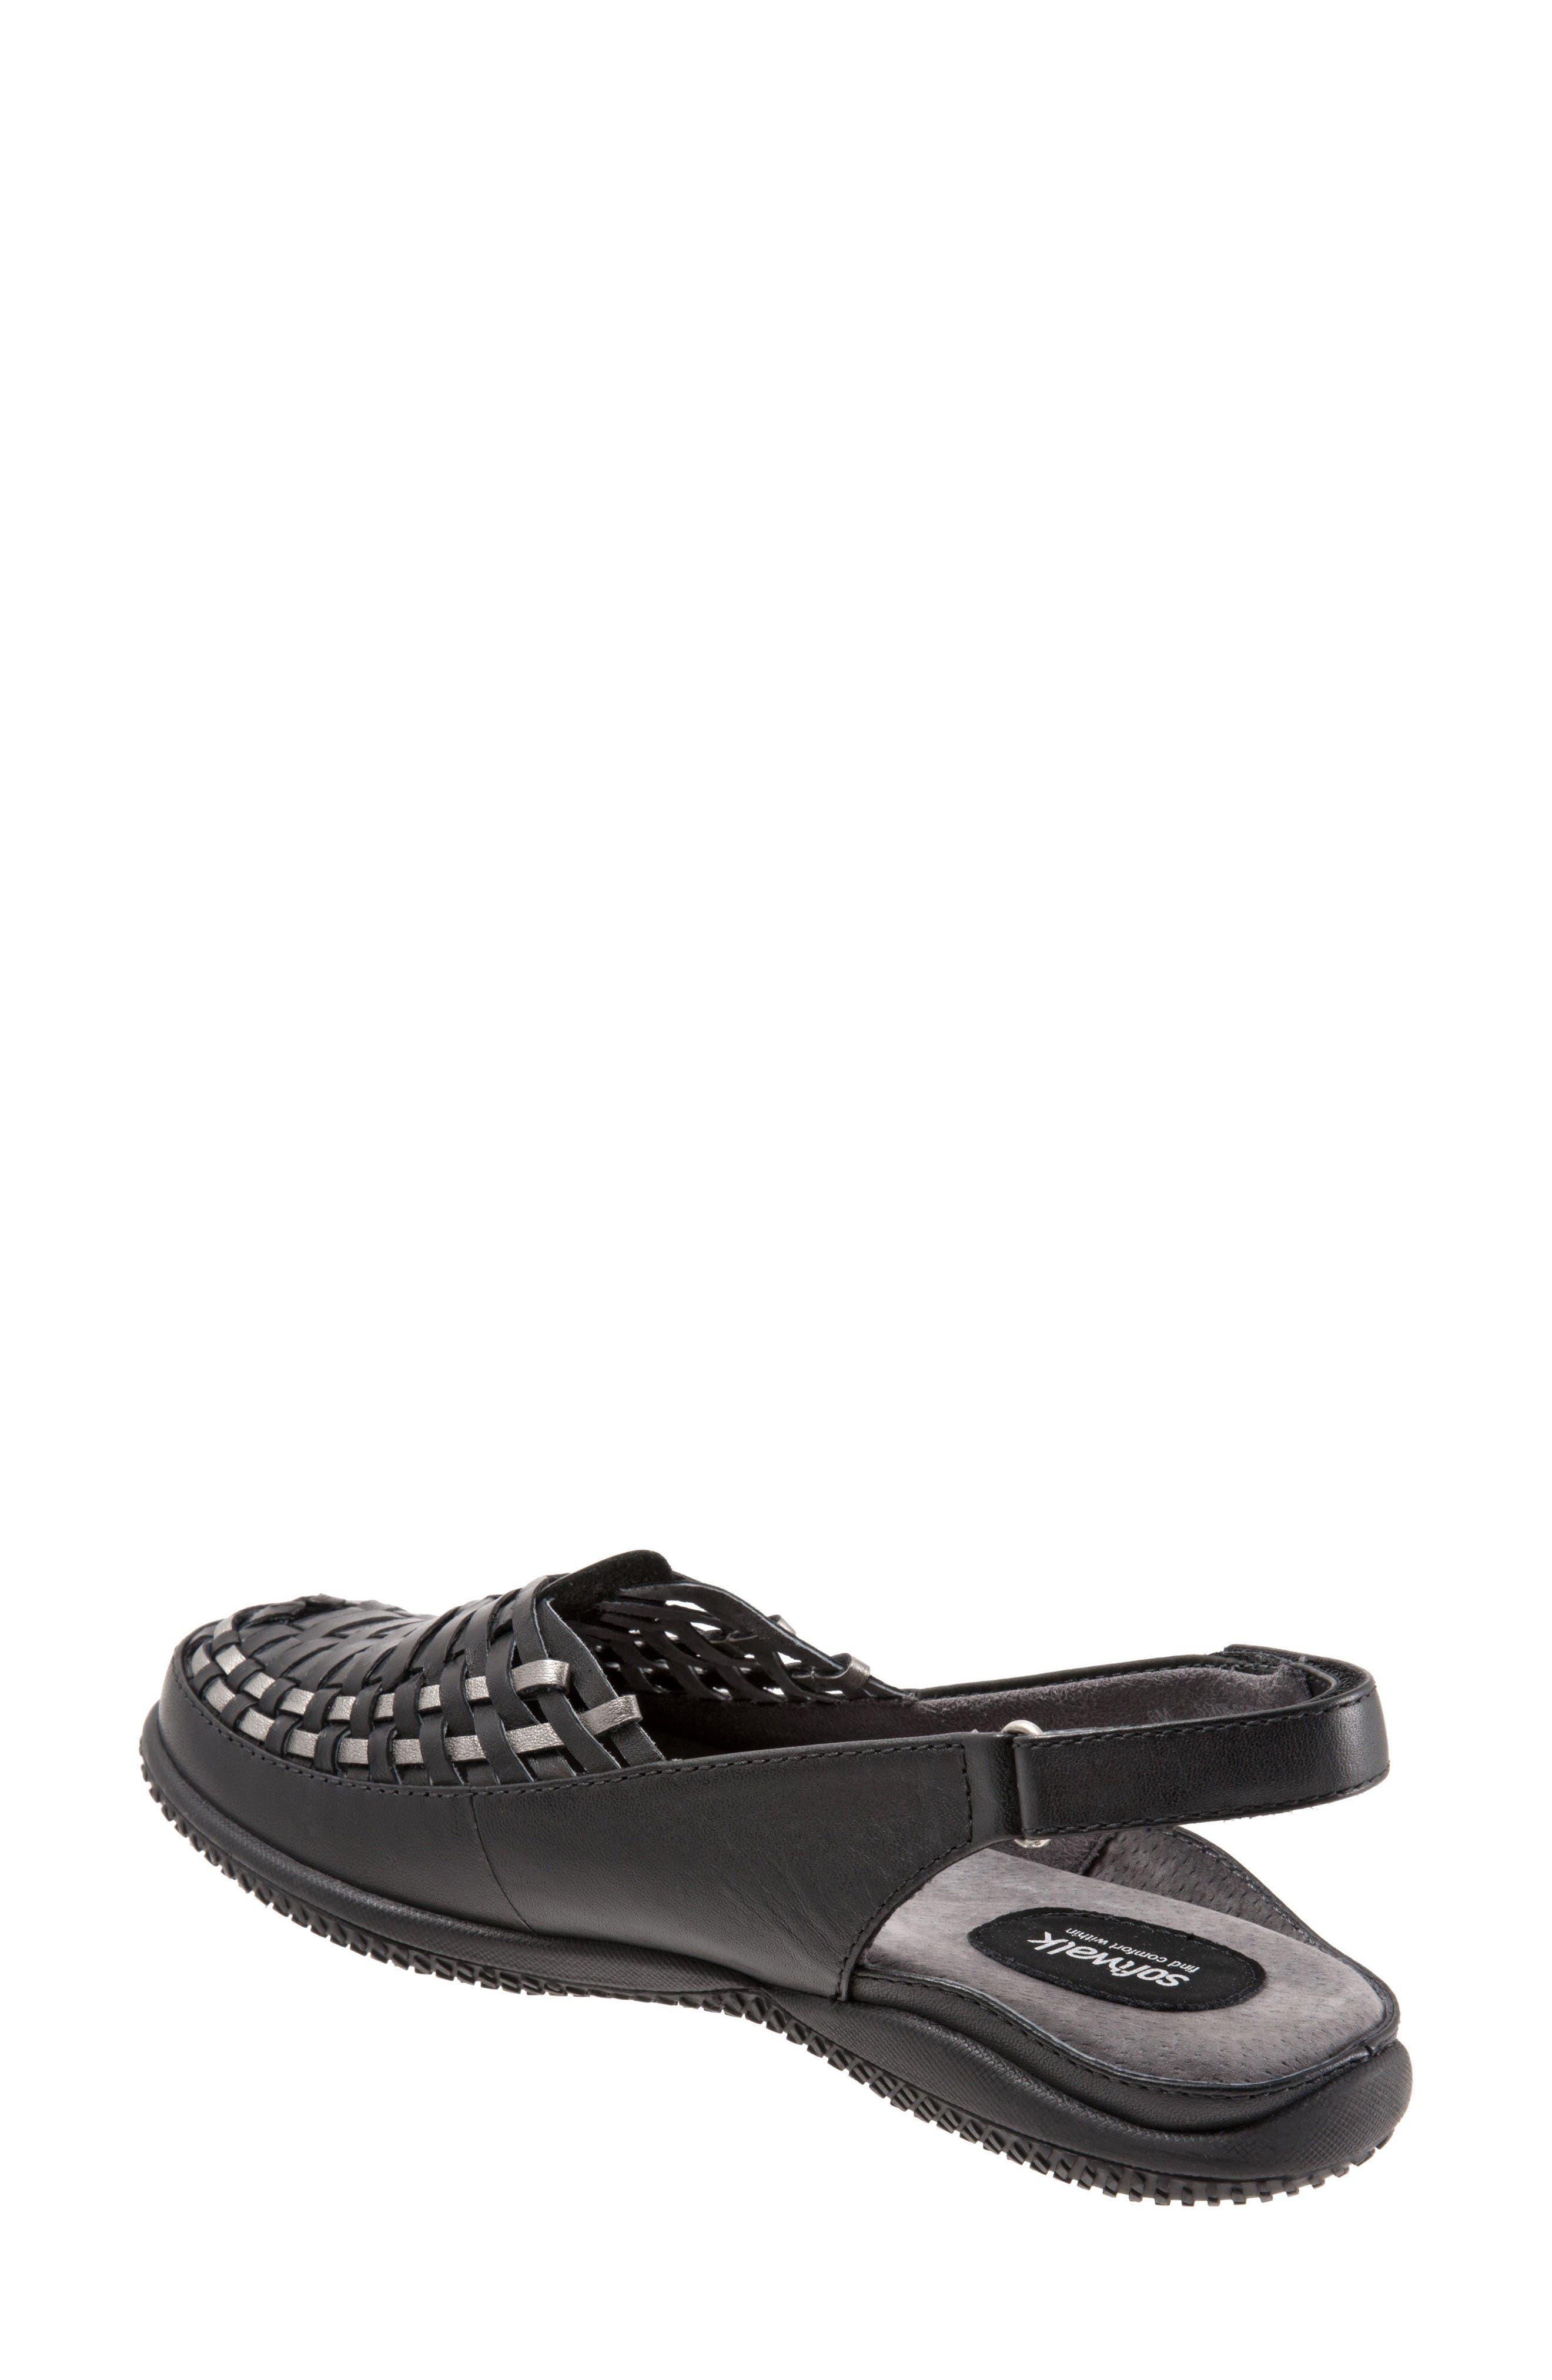 Harper Slingback Clog,                             Alternate thumbnail 2, color,                             Black/ Pewter Leather